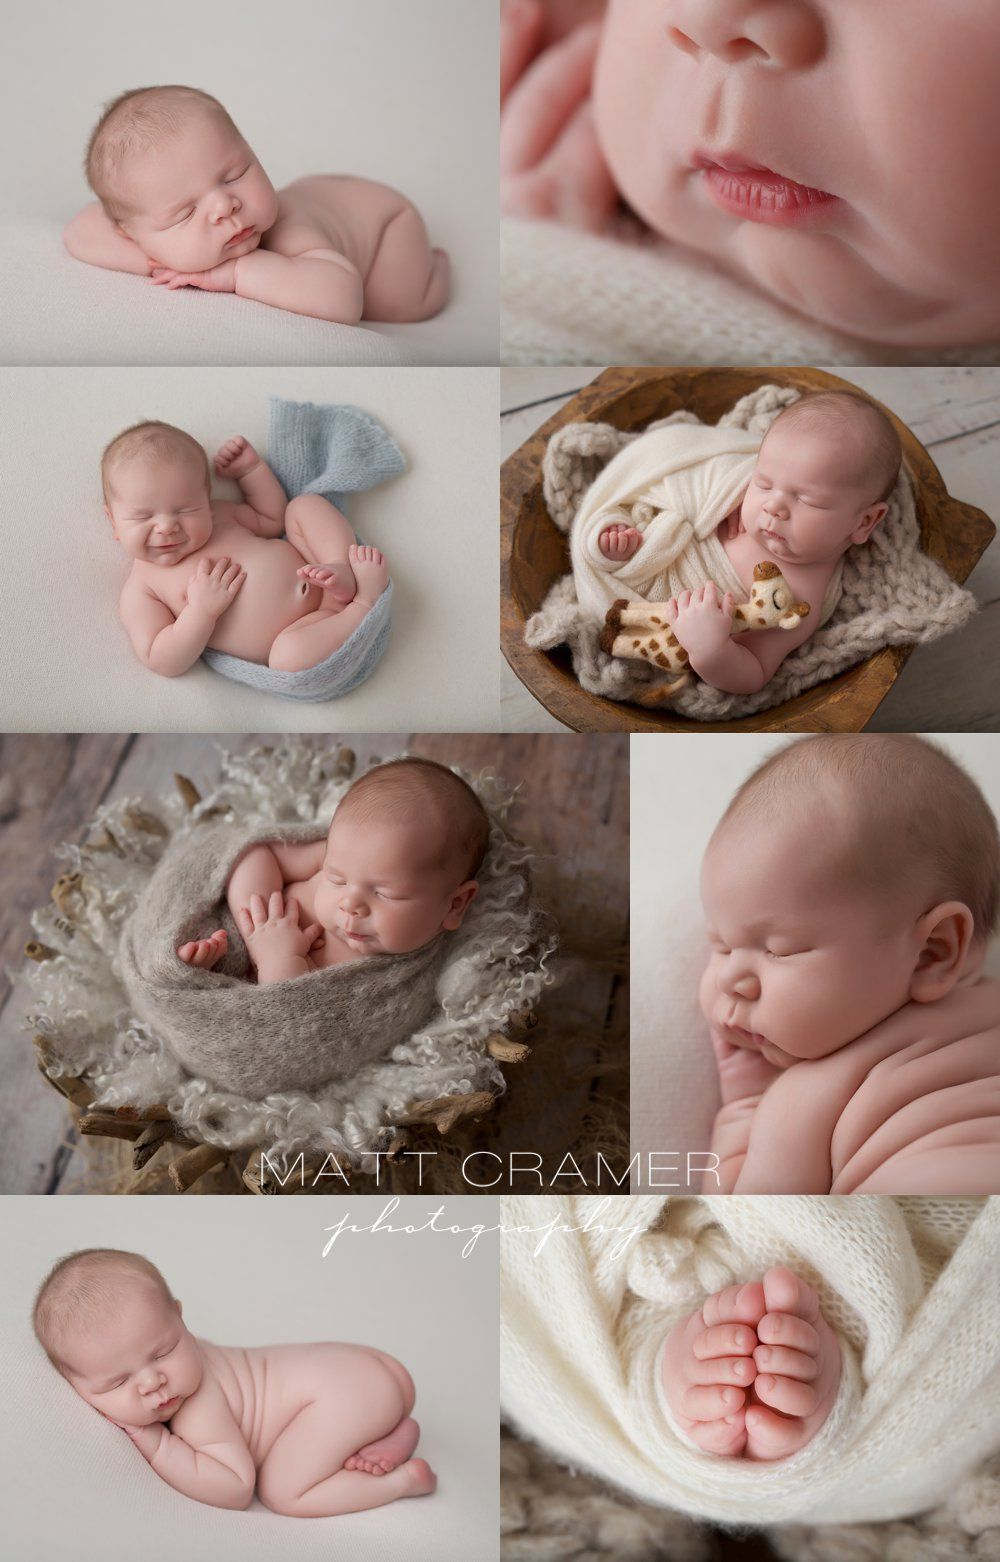 Creative Boy Newborn Photography Posing Ideas Using Simple Posing And Props Too Newbor Newborn Photography Boy Newborn Baby Photography Baby Photography